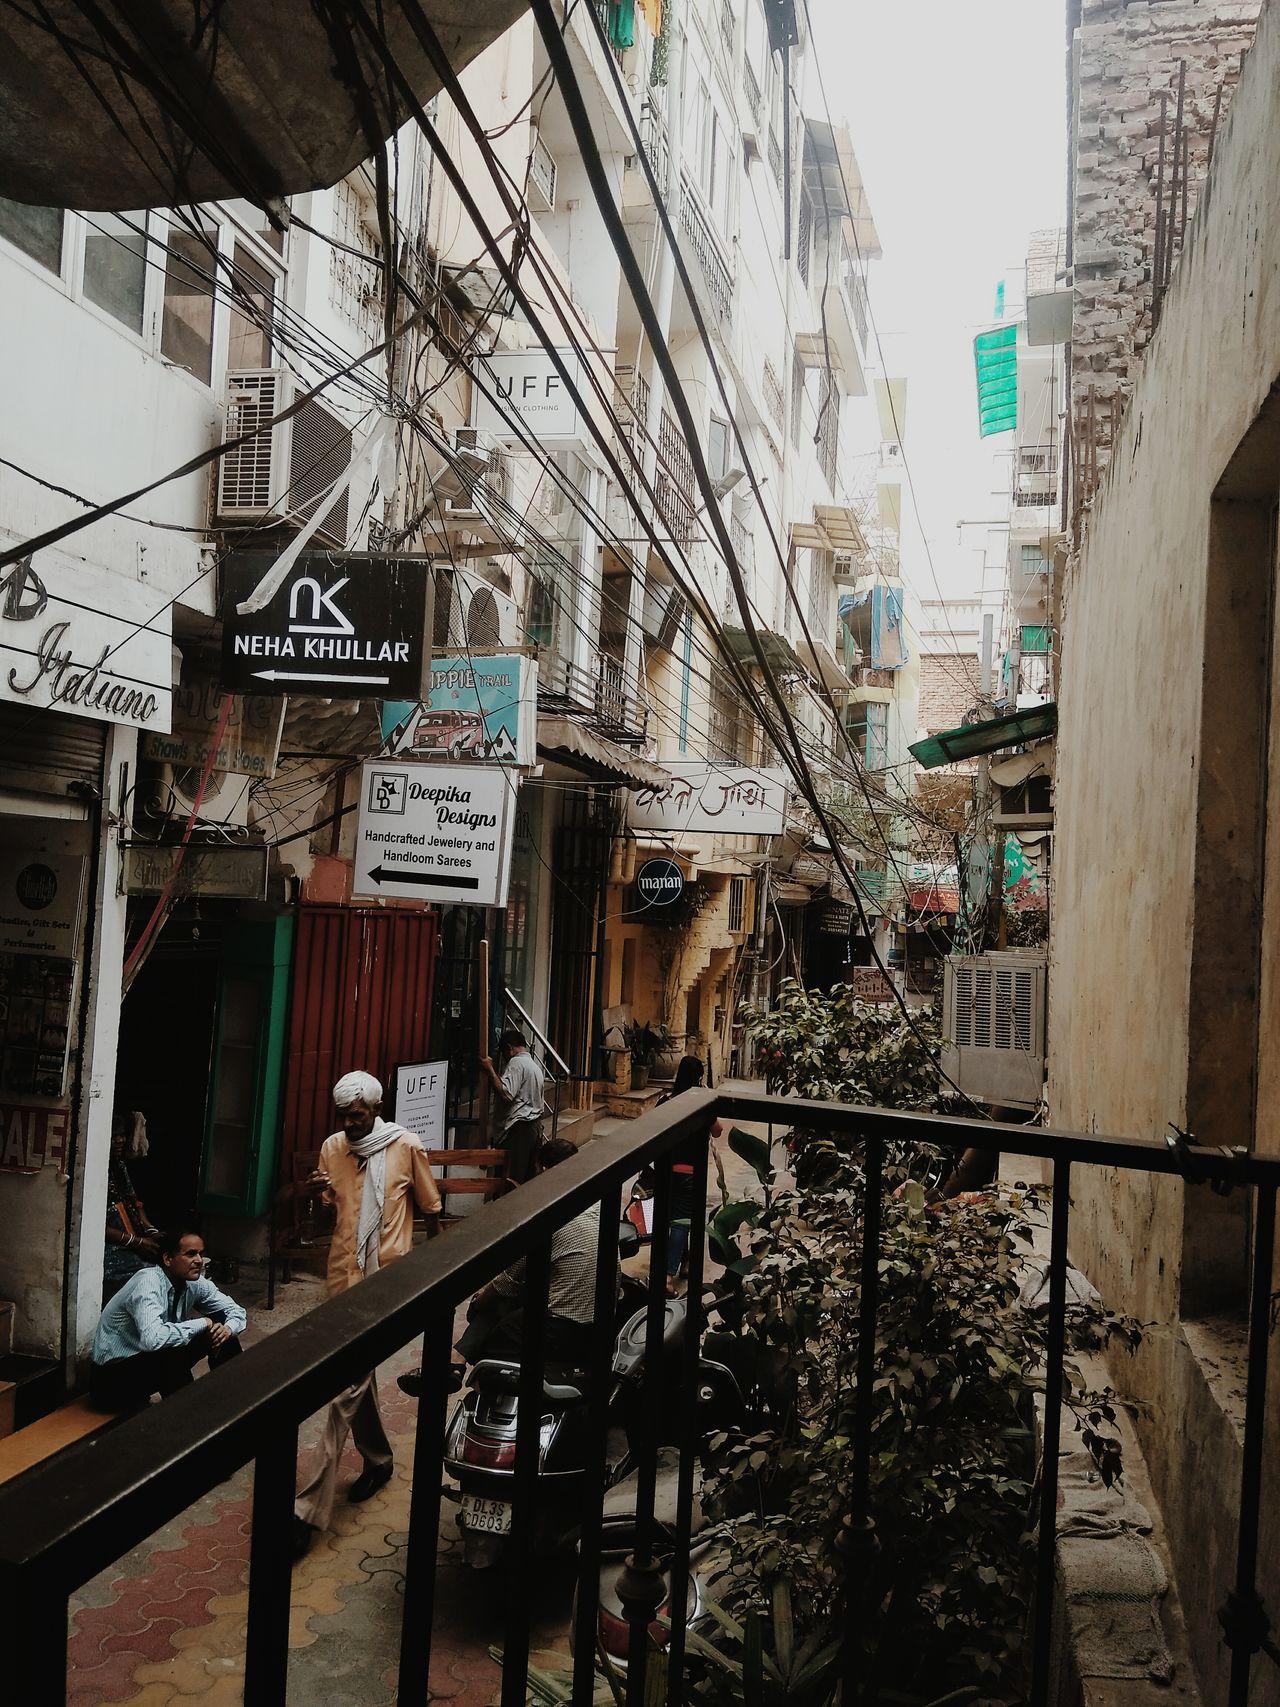 i was embarrassingly touristy Sky Architecture Day Streetphotography Hauzkhasvillage Hauzkhas Delhi Hauzkhassocial eye EyeEmNewHere EyeEm Best Shots EyeEmBestPics